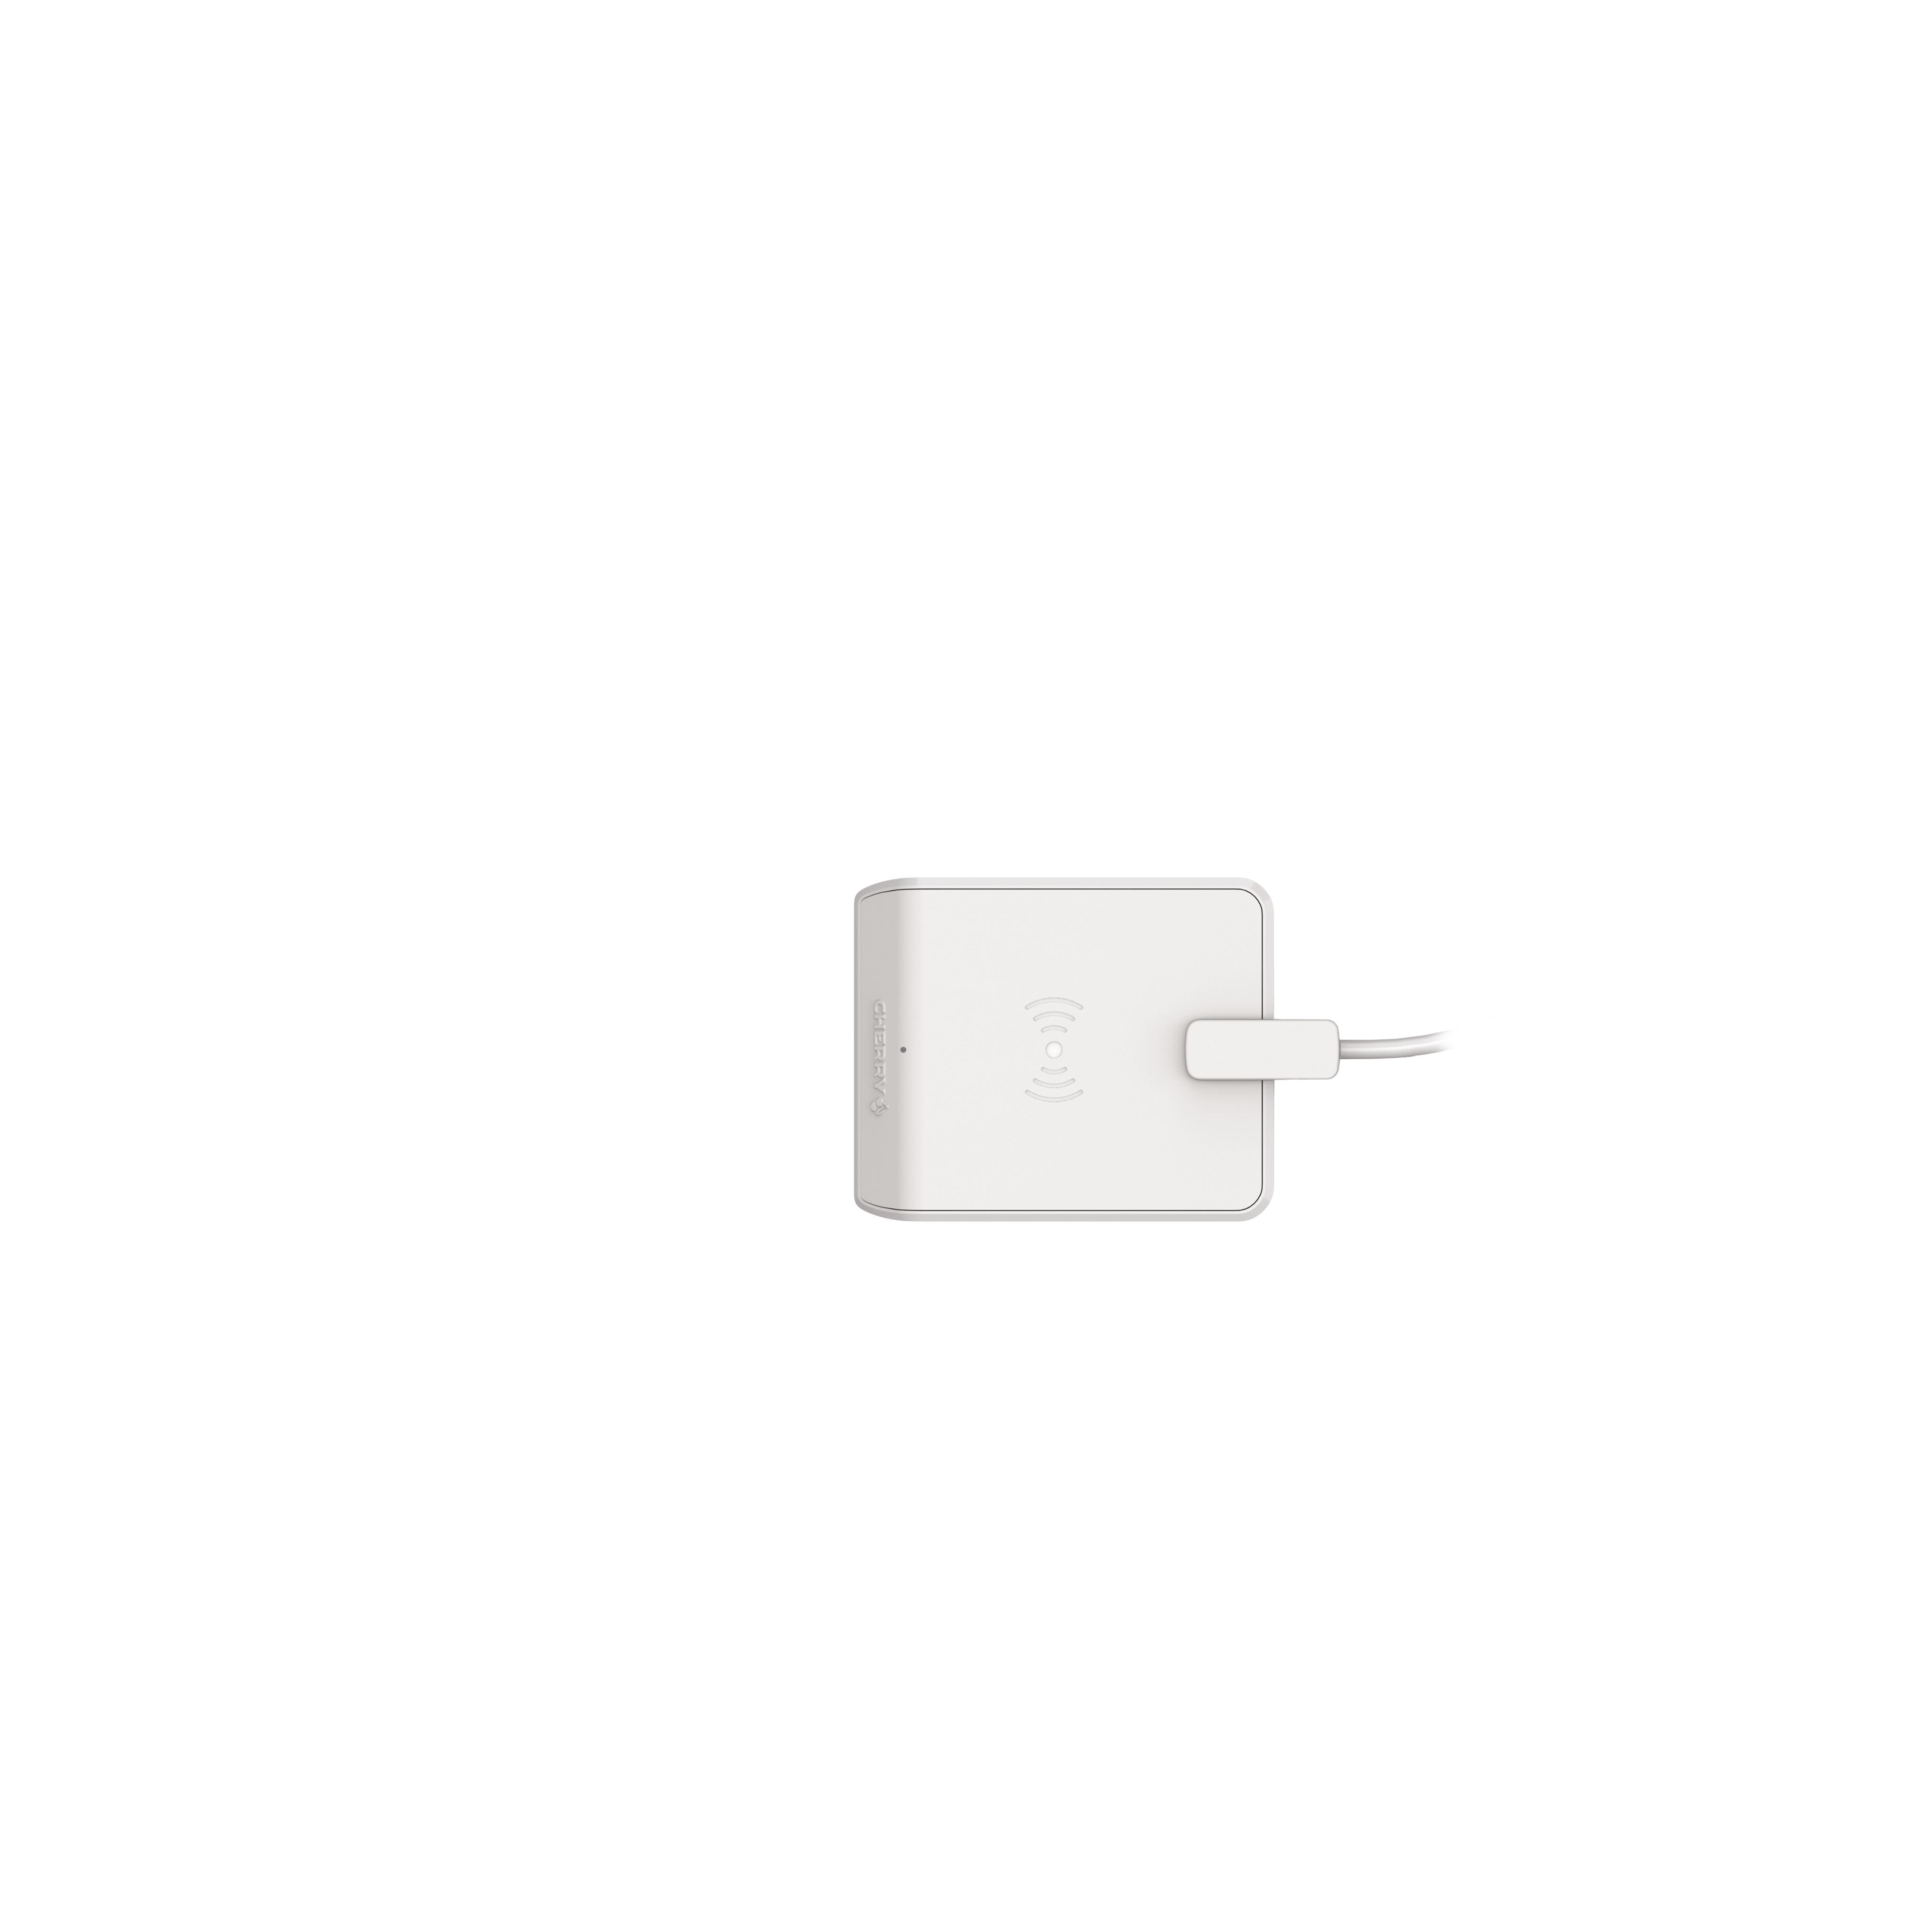 CHERRY SmartCardTerminal TC 1200 USB Klasse1 cardreader grey